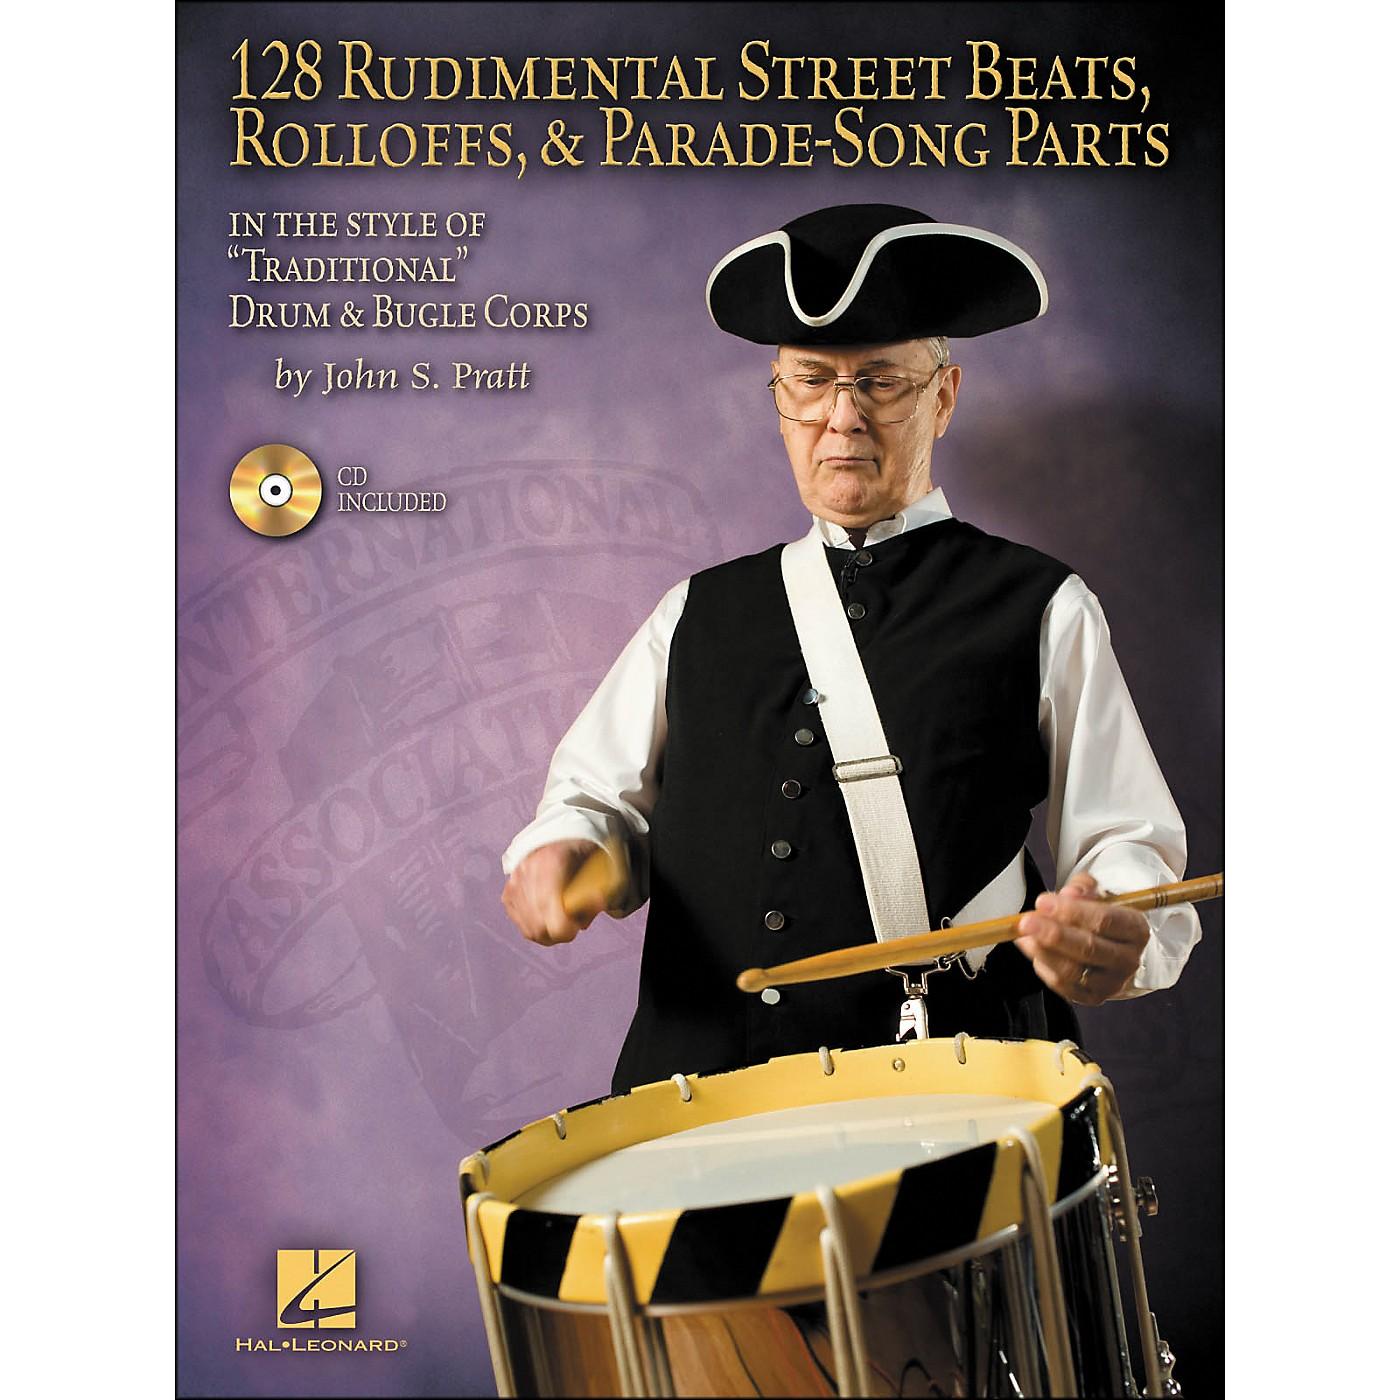 Hal Leonard 128 Rudimental Street Beats, Rolloffs, & Parade-Song Parts Book/CD thumbnail